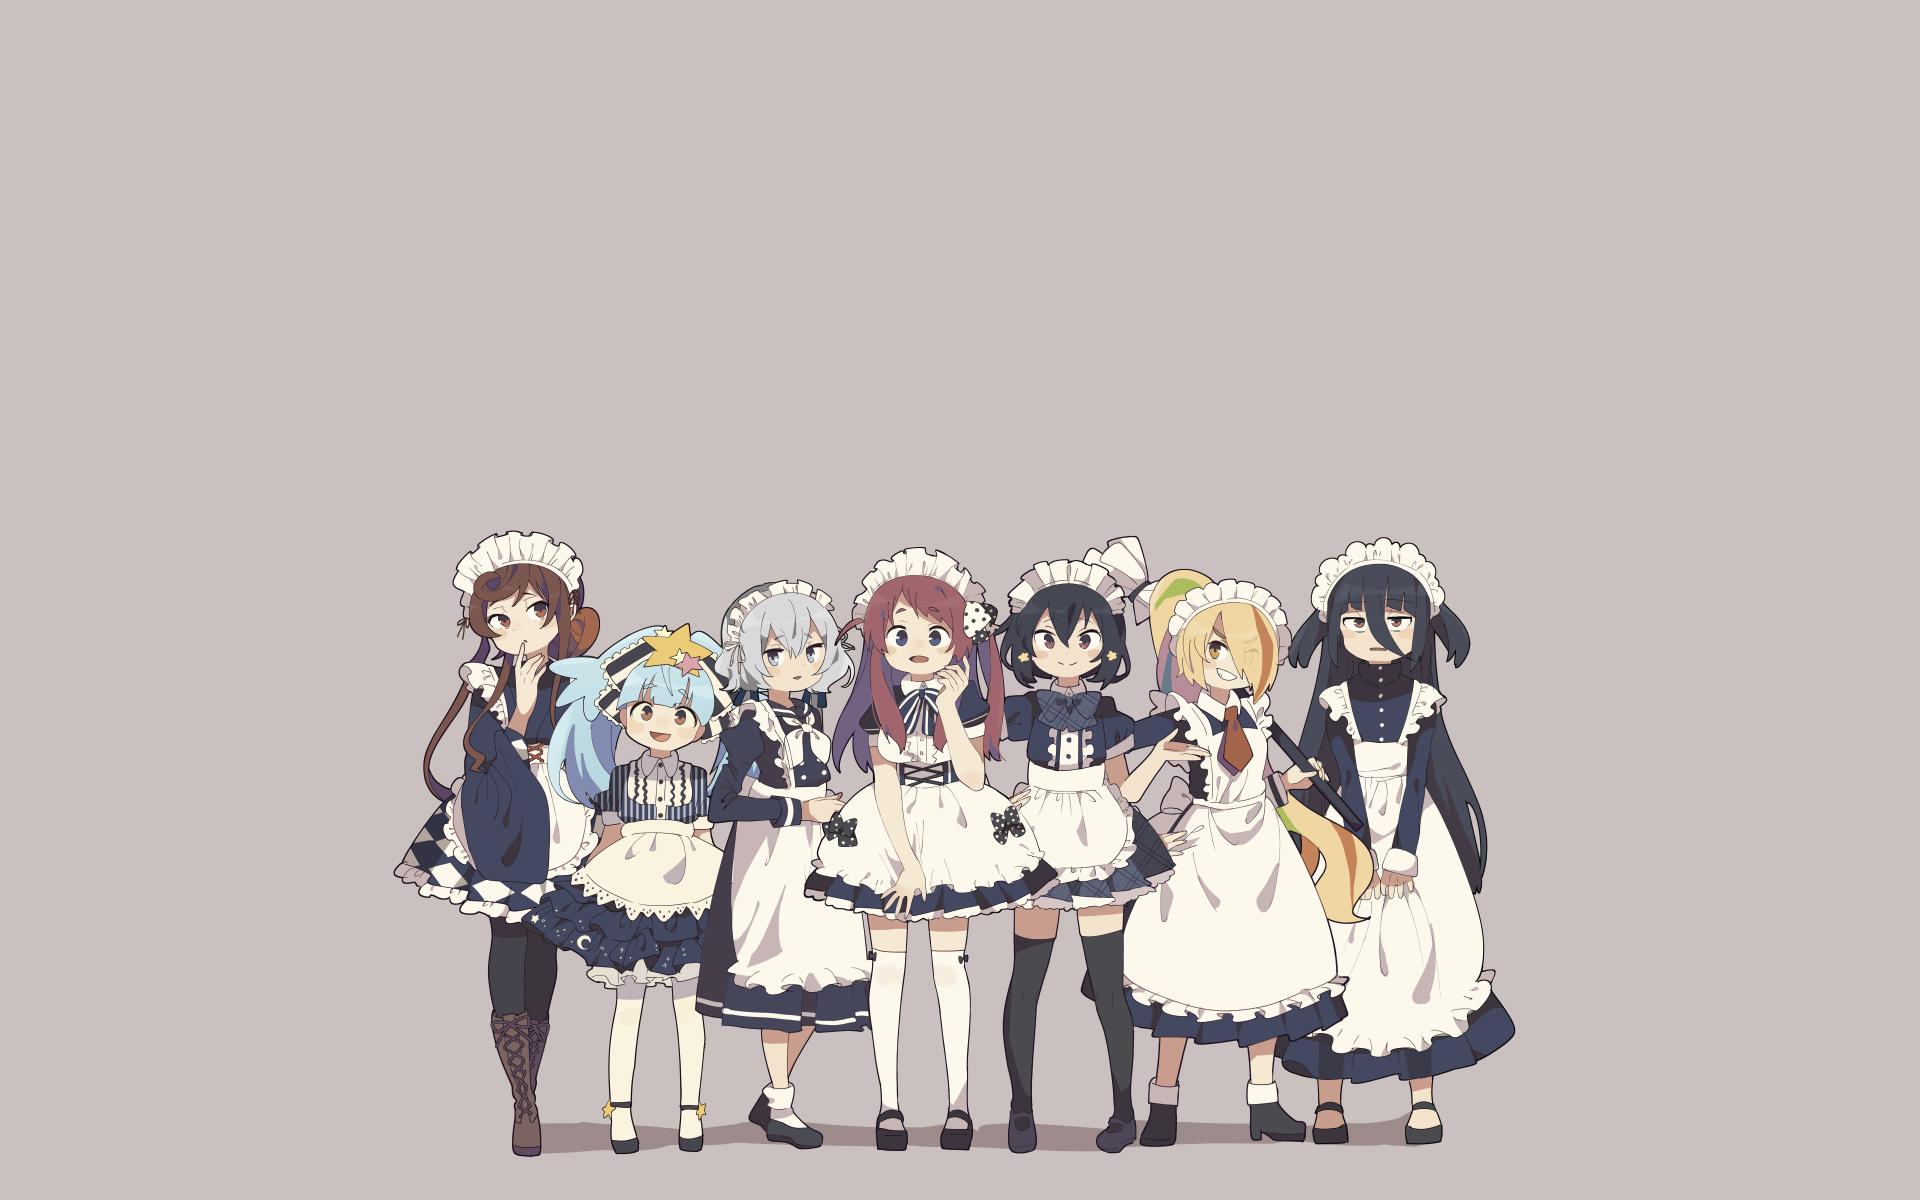 Simple Background Anime Anime Girls Zombieland Saga 1920x1200